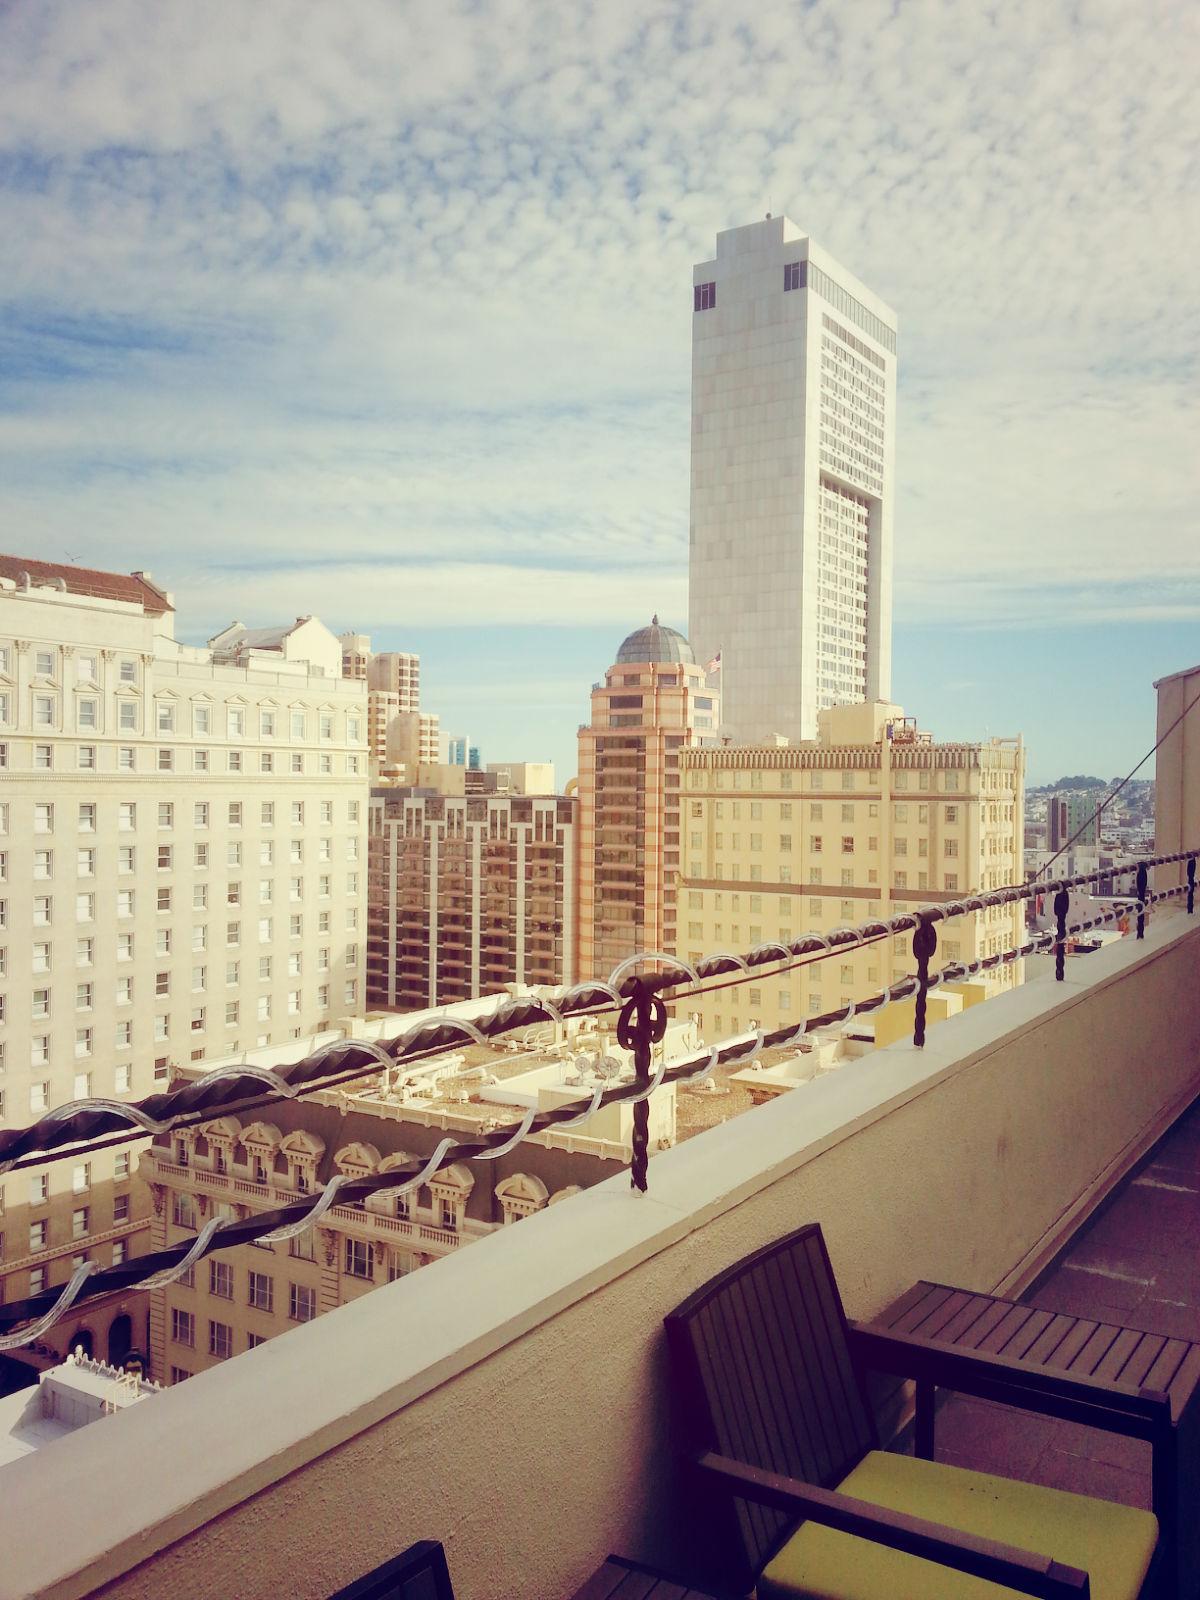 Another terrace view, Samuel Suite, Hotel Adagio